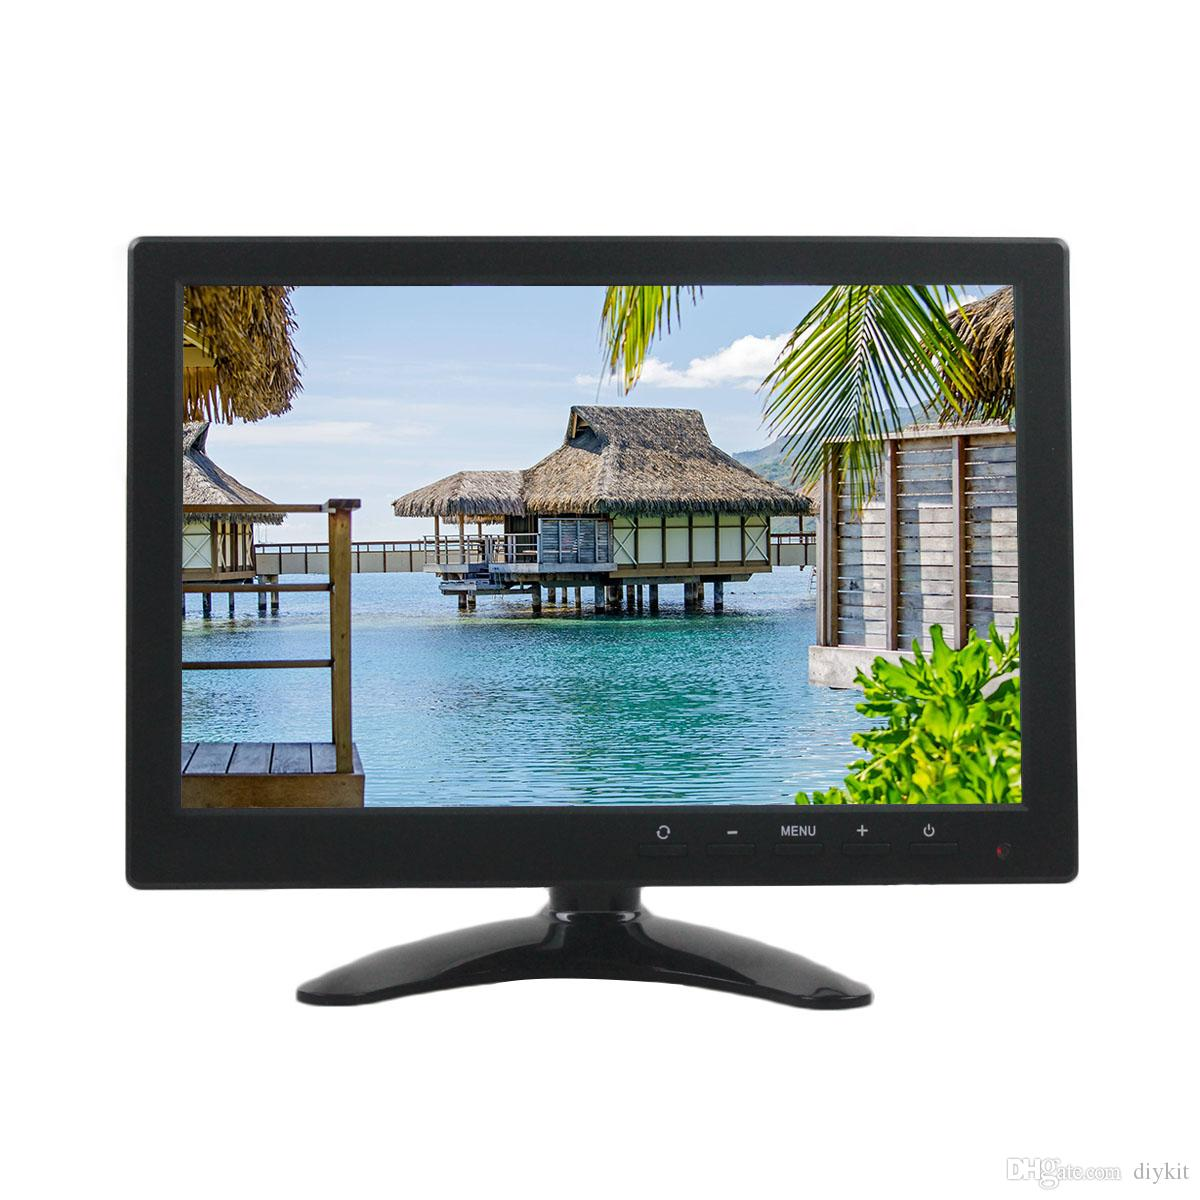 DIYKIT 10.1 inch TFT LCD HD Car Monitor Rear View Monitor Build in Speaker with BNC / AV / VGA / HDMI Input